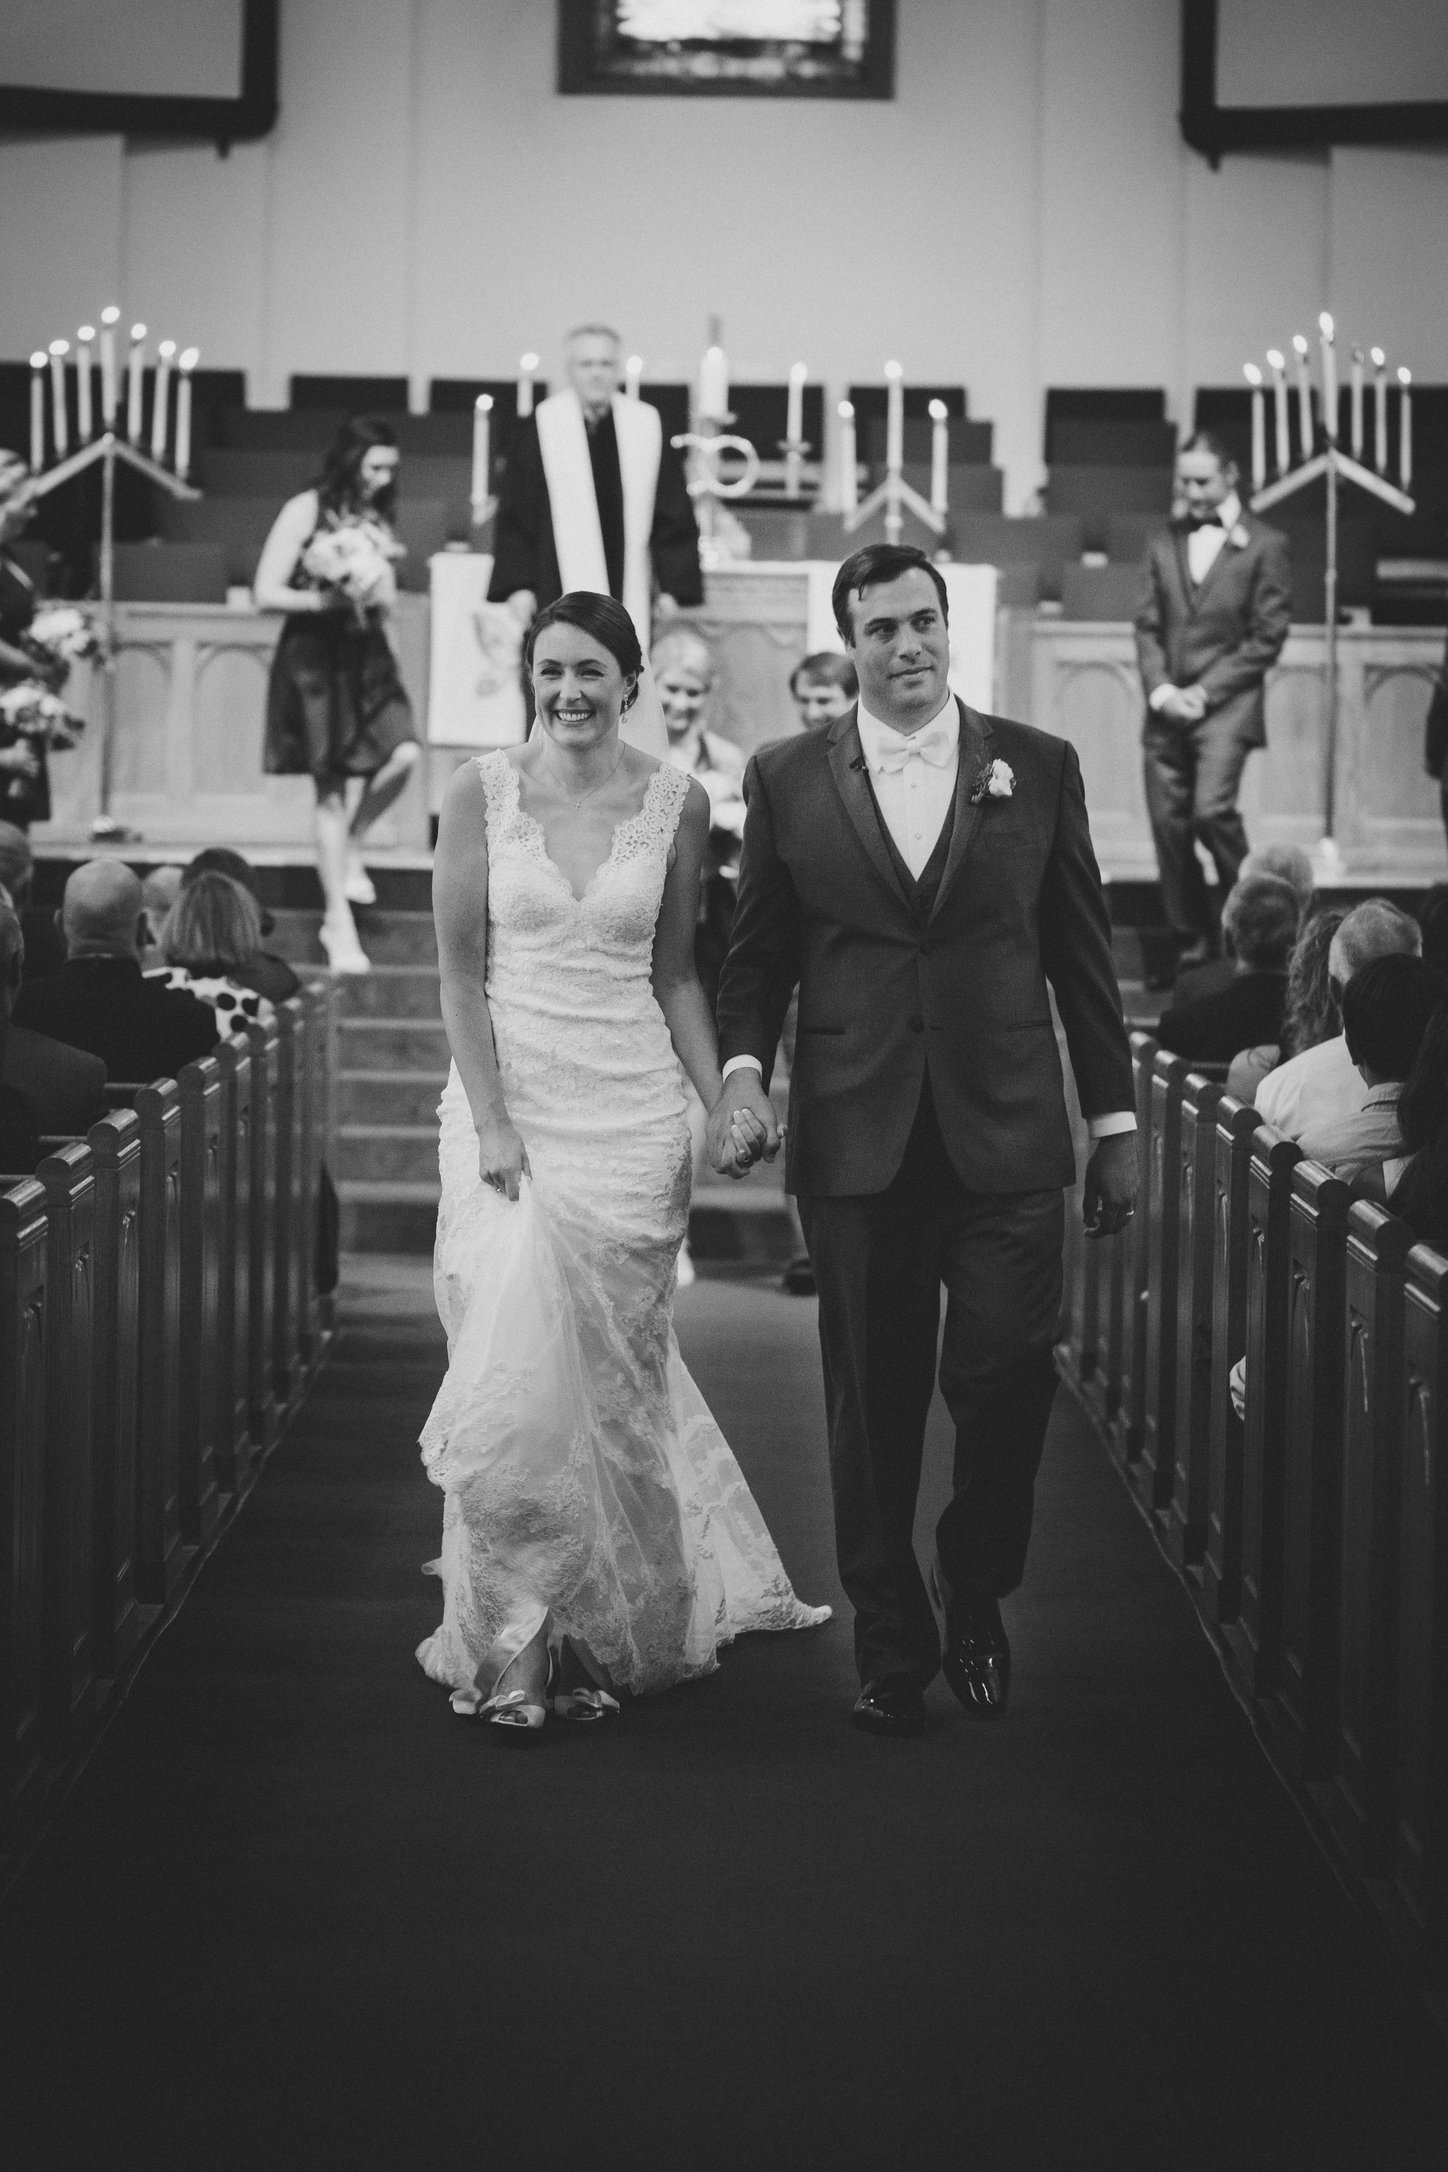 SandC-wedding-229.jpg